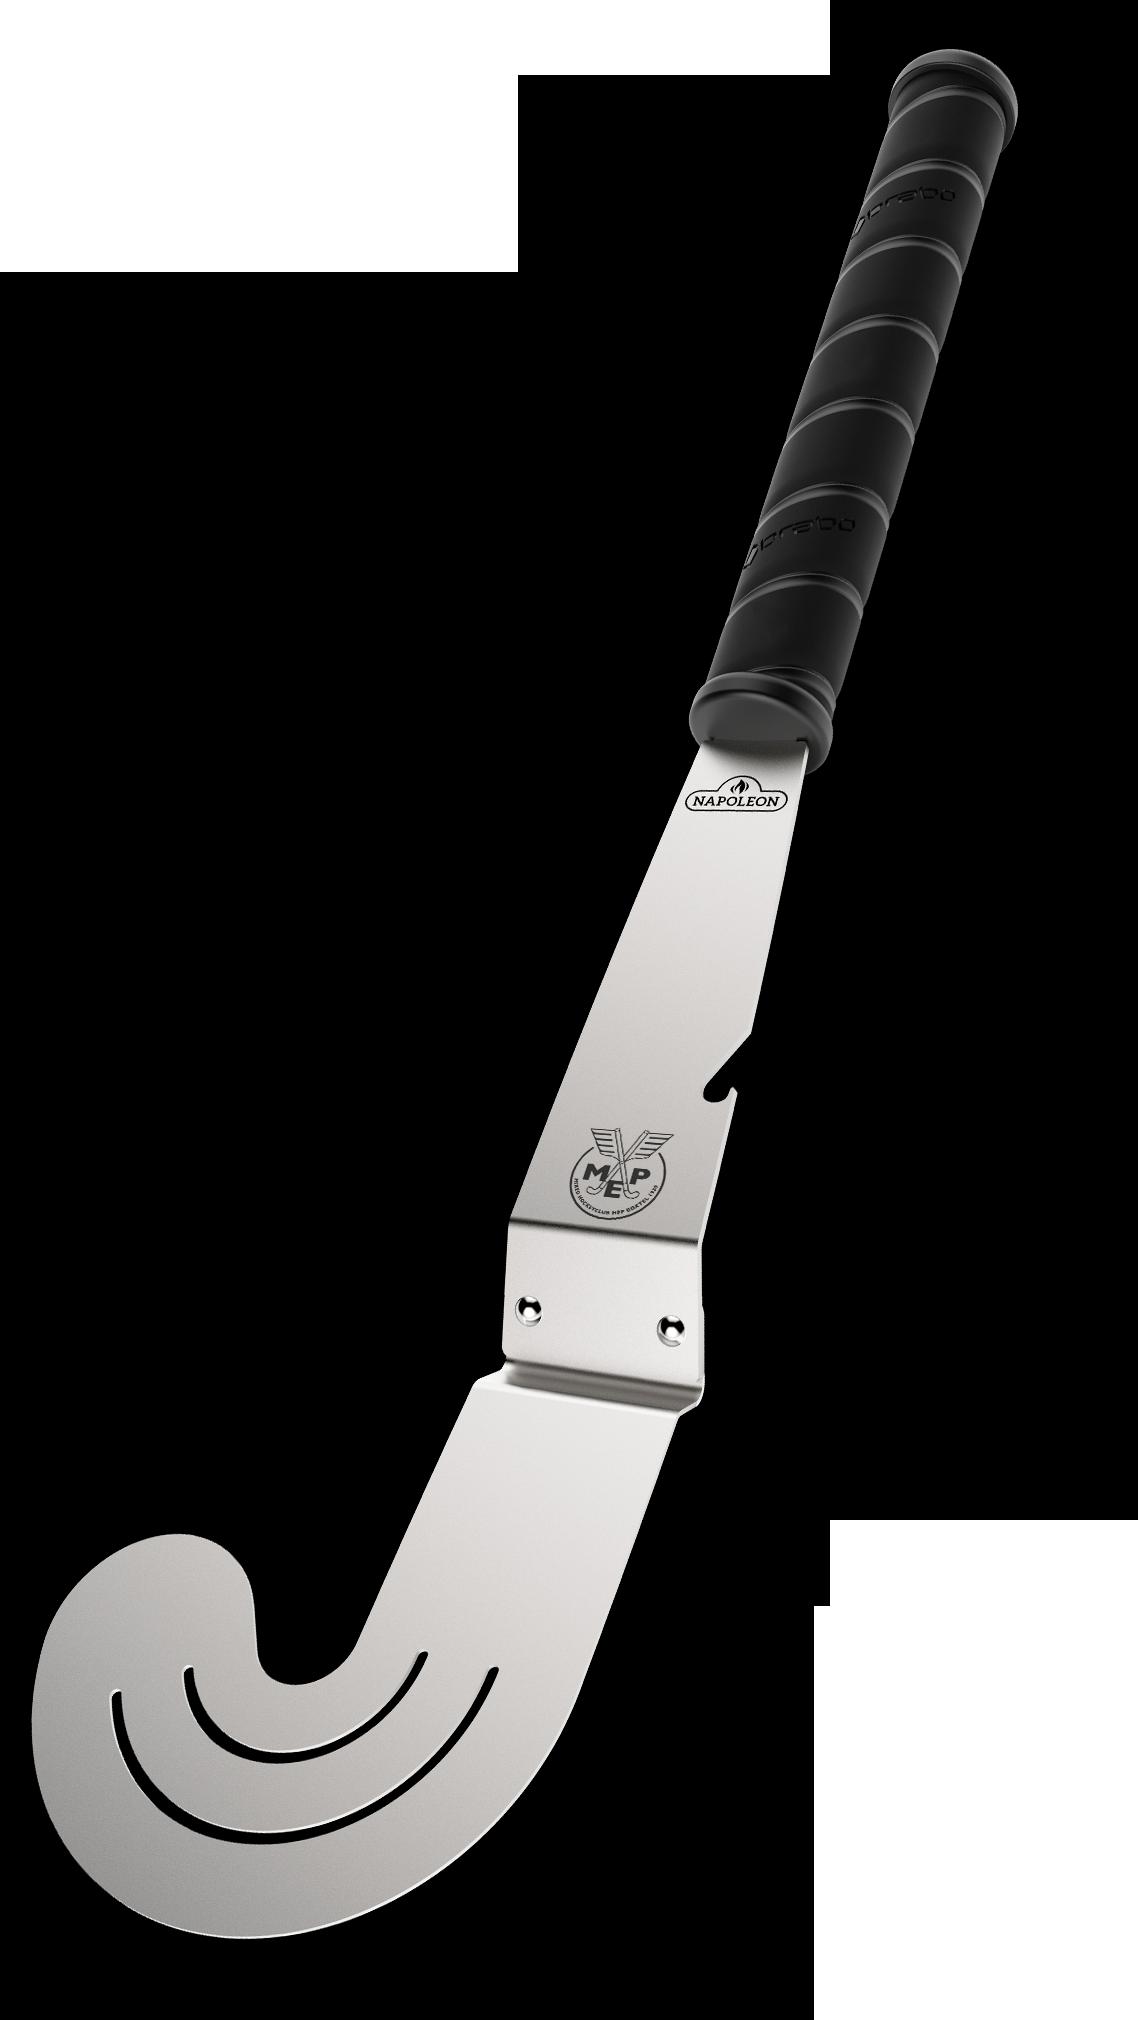 MHC MEP Hockey BBQ Stick